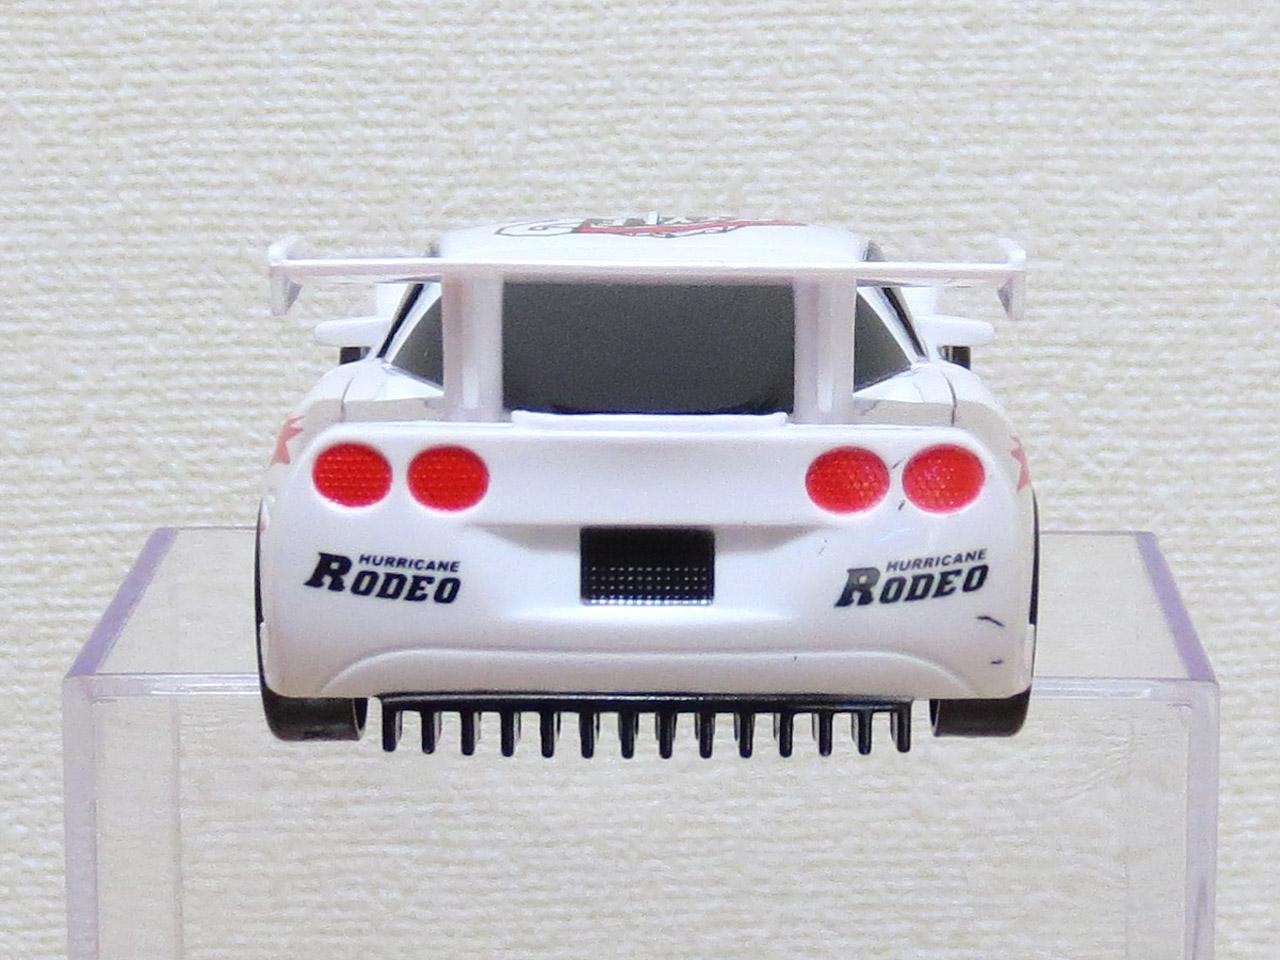 Change_Car_Robot_Doujin_22.jpg